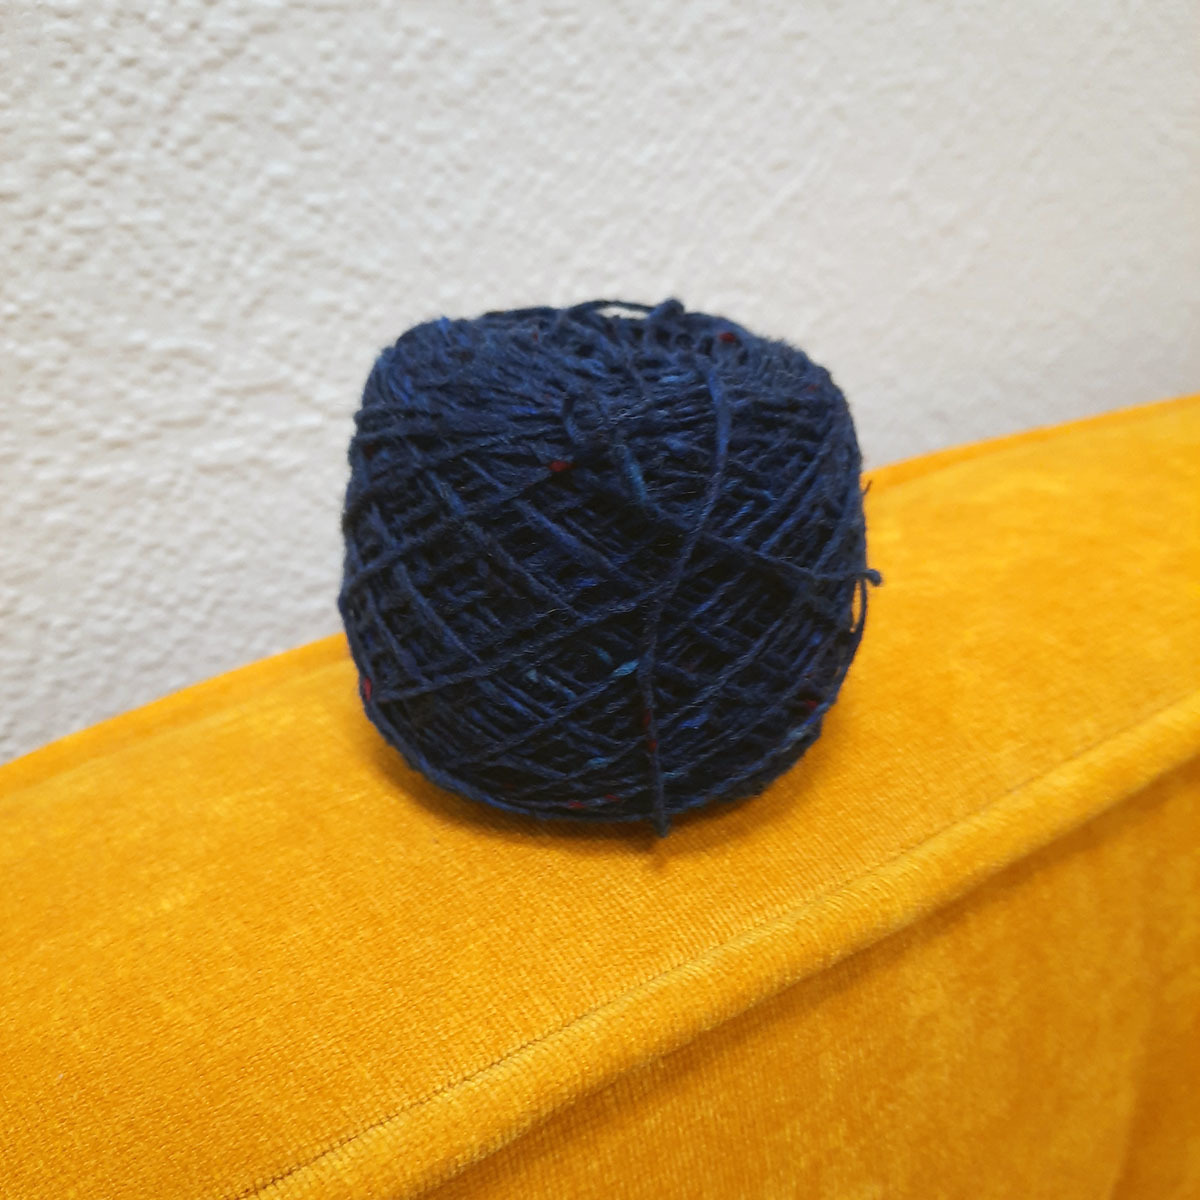 Knoll Yarns Soft Donegal (одинарный твид) sale - 5527